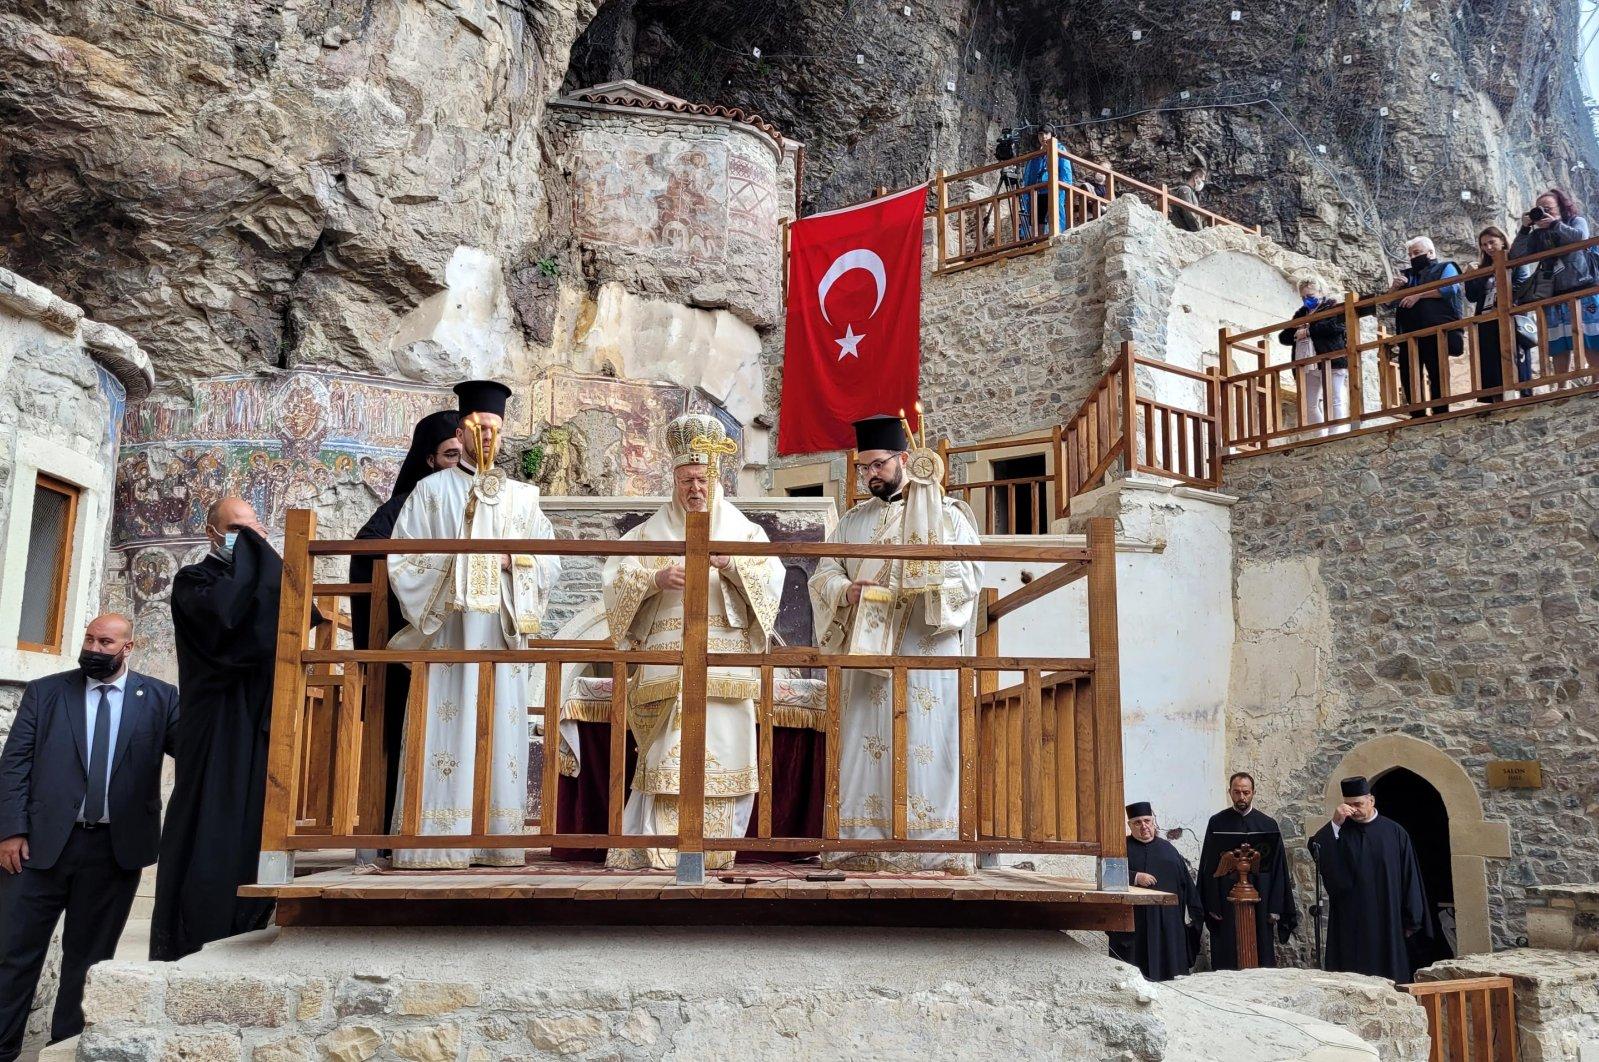 Patriarch Bartholomew I (C) presides the mass at Sümela Monastery, Trabzon, northern Turkey, Aug. 15, 2021. (DHA PHOTO)